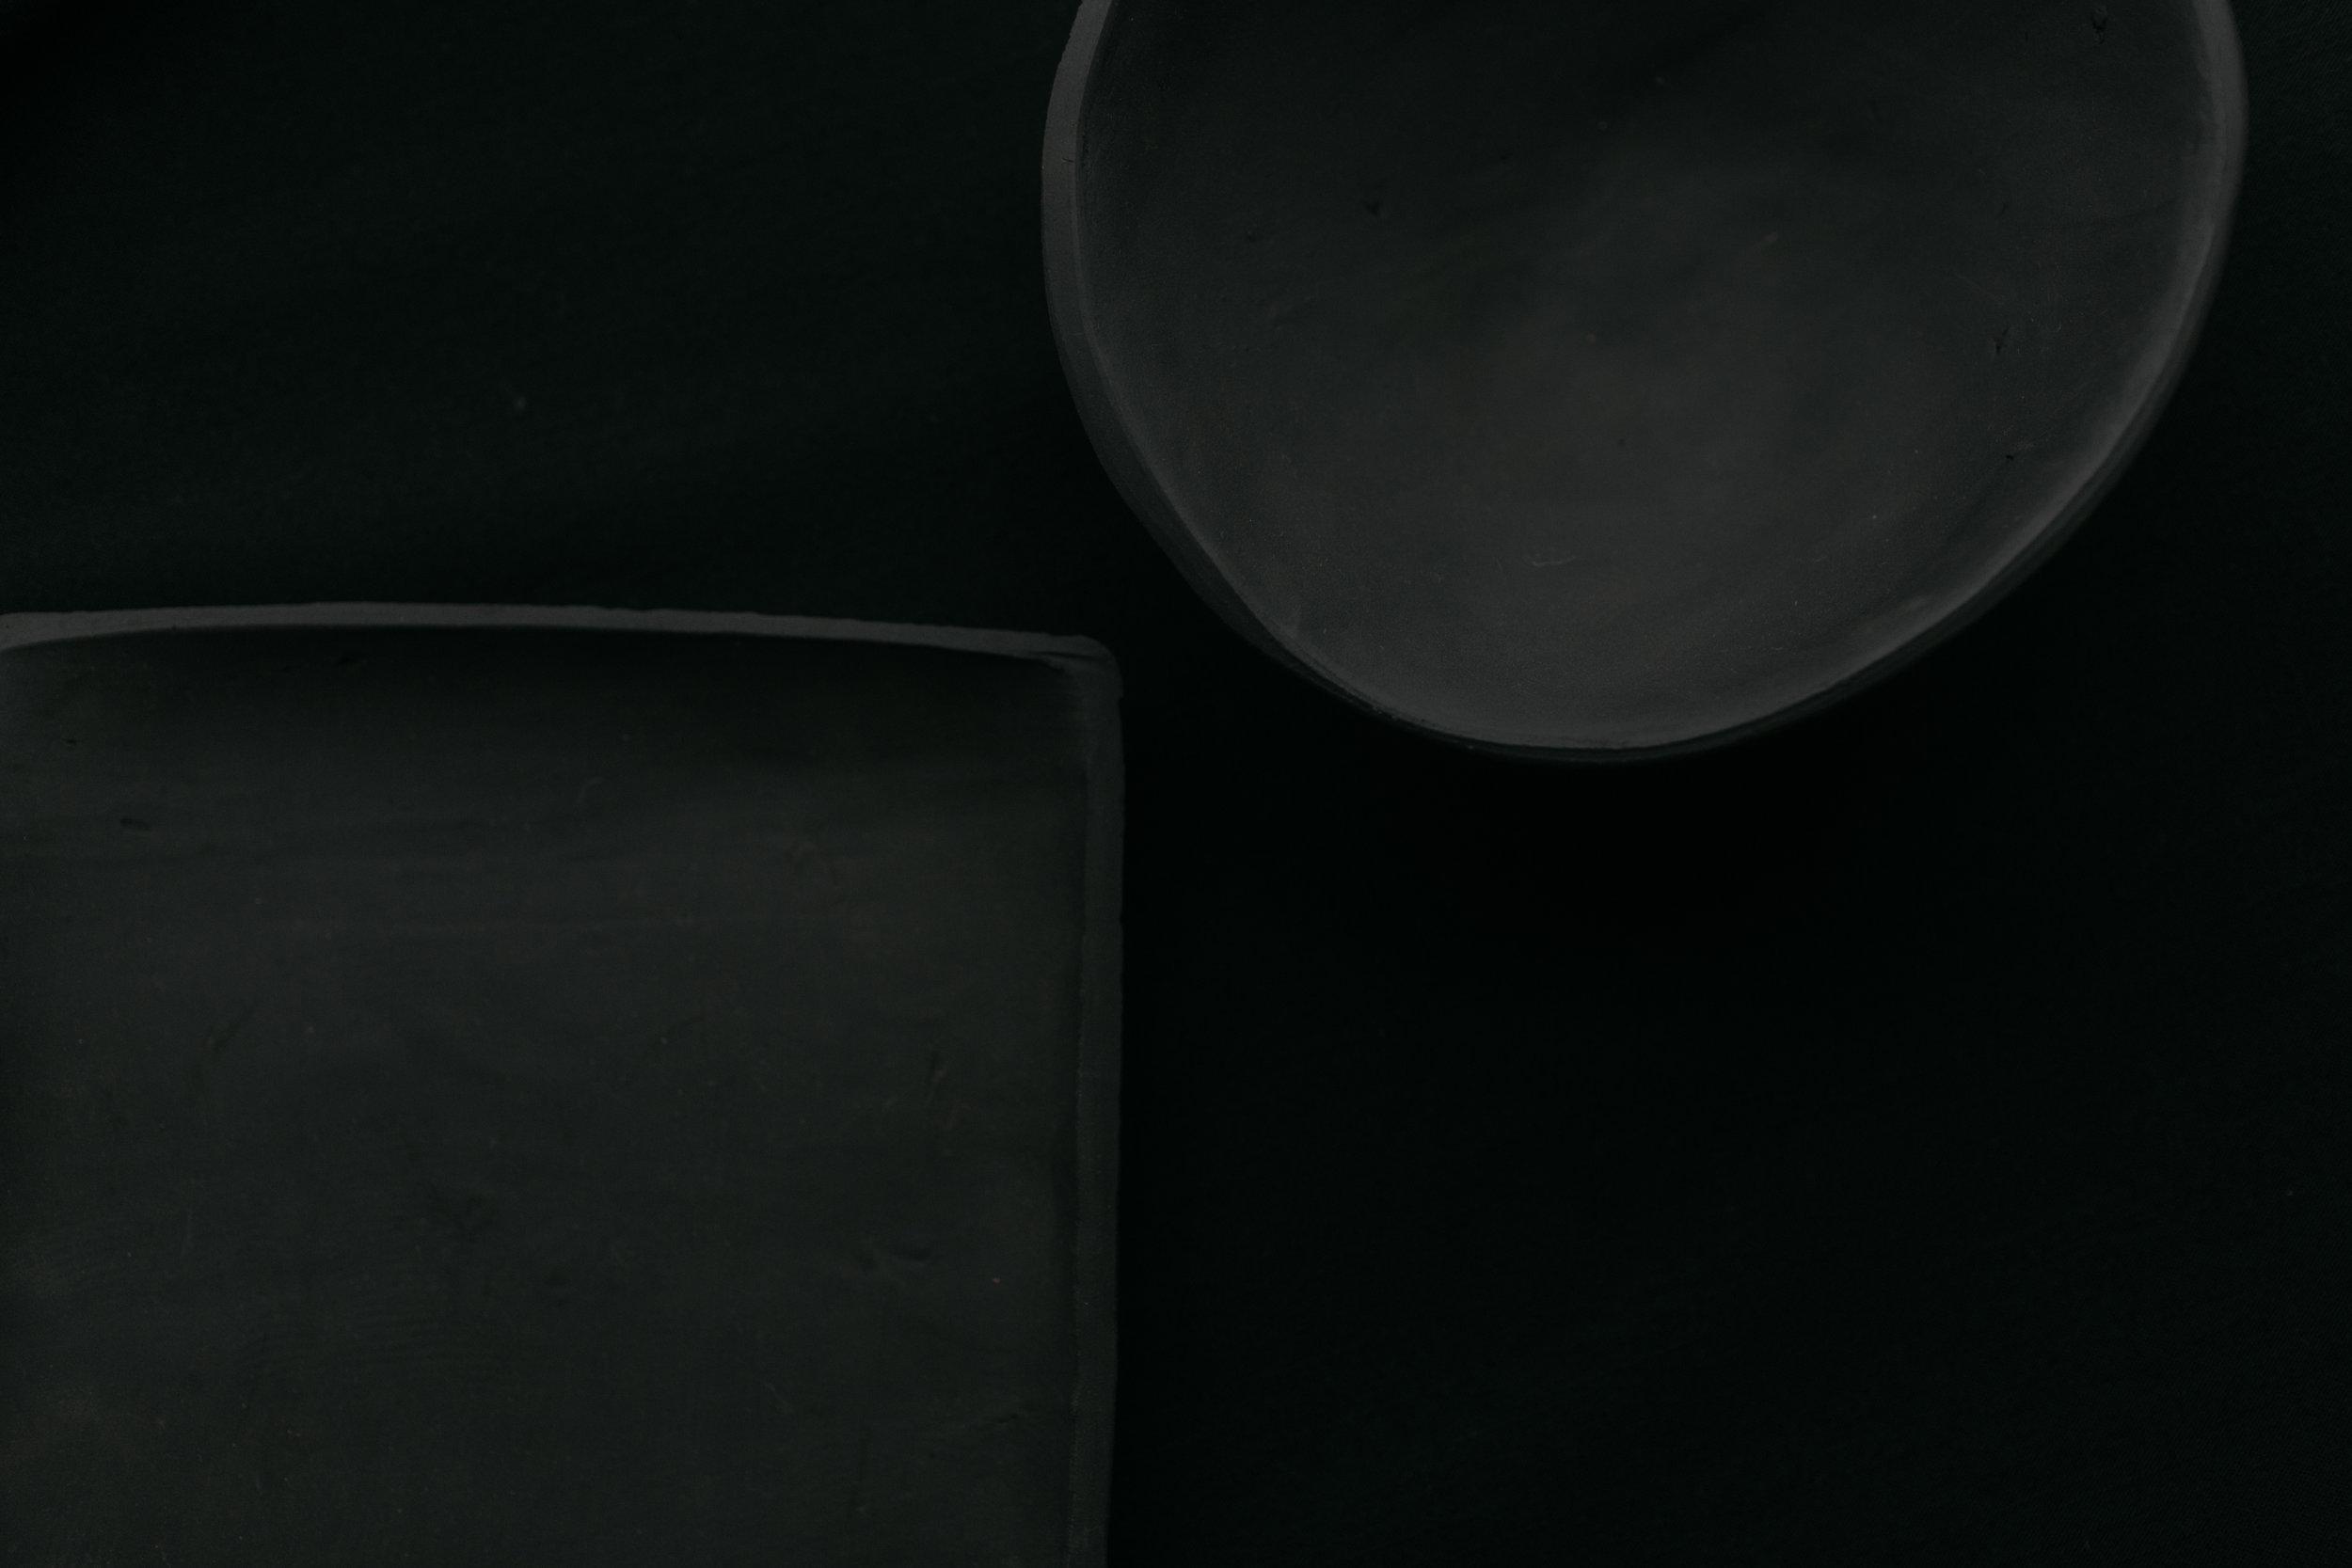 CivilStonware-EditOne-Anna-Howard-49.jpg